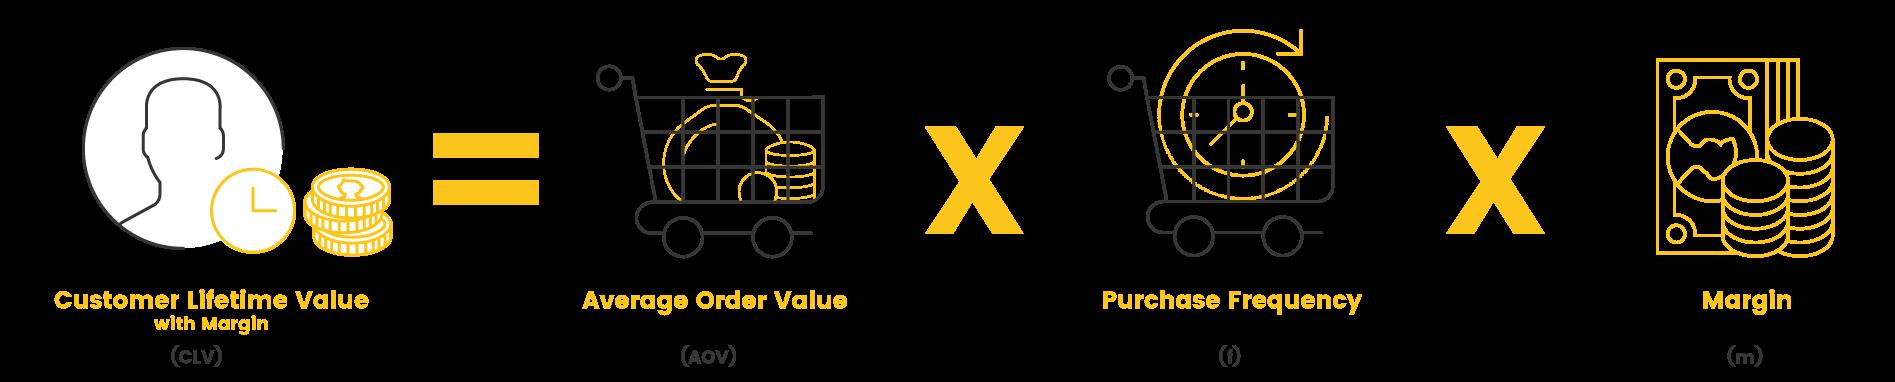 clv customer lifetime value with margin